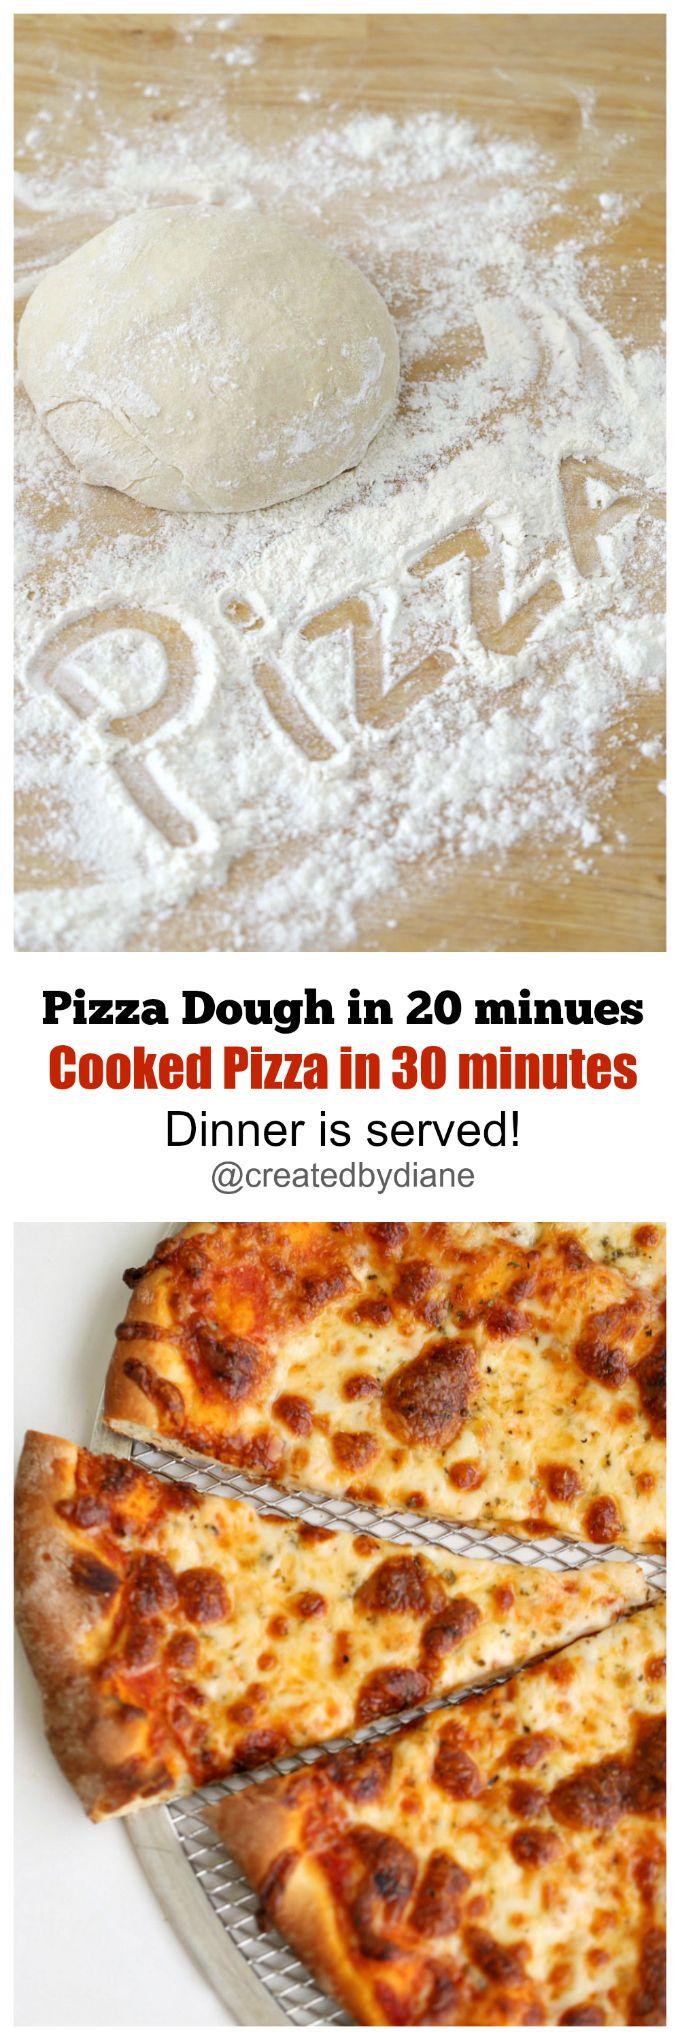 237 best Pizza images on Pinterest